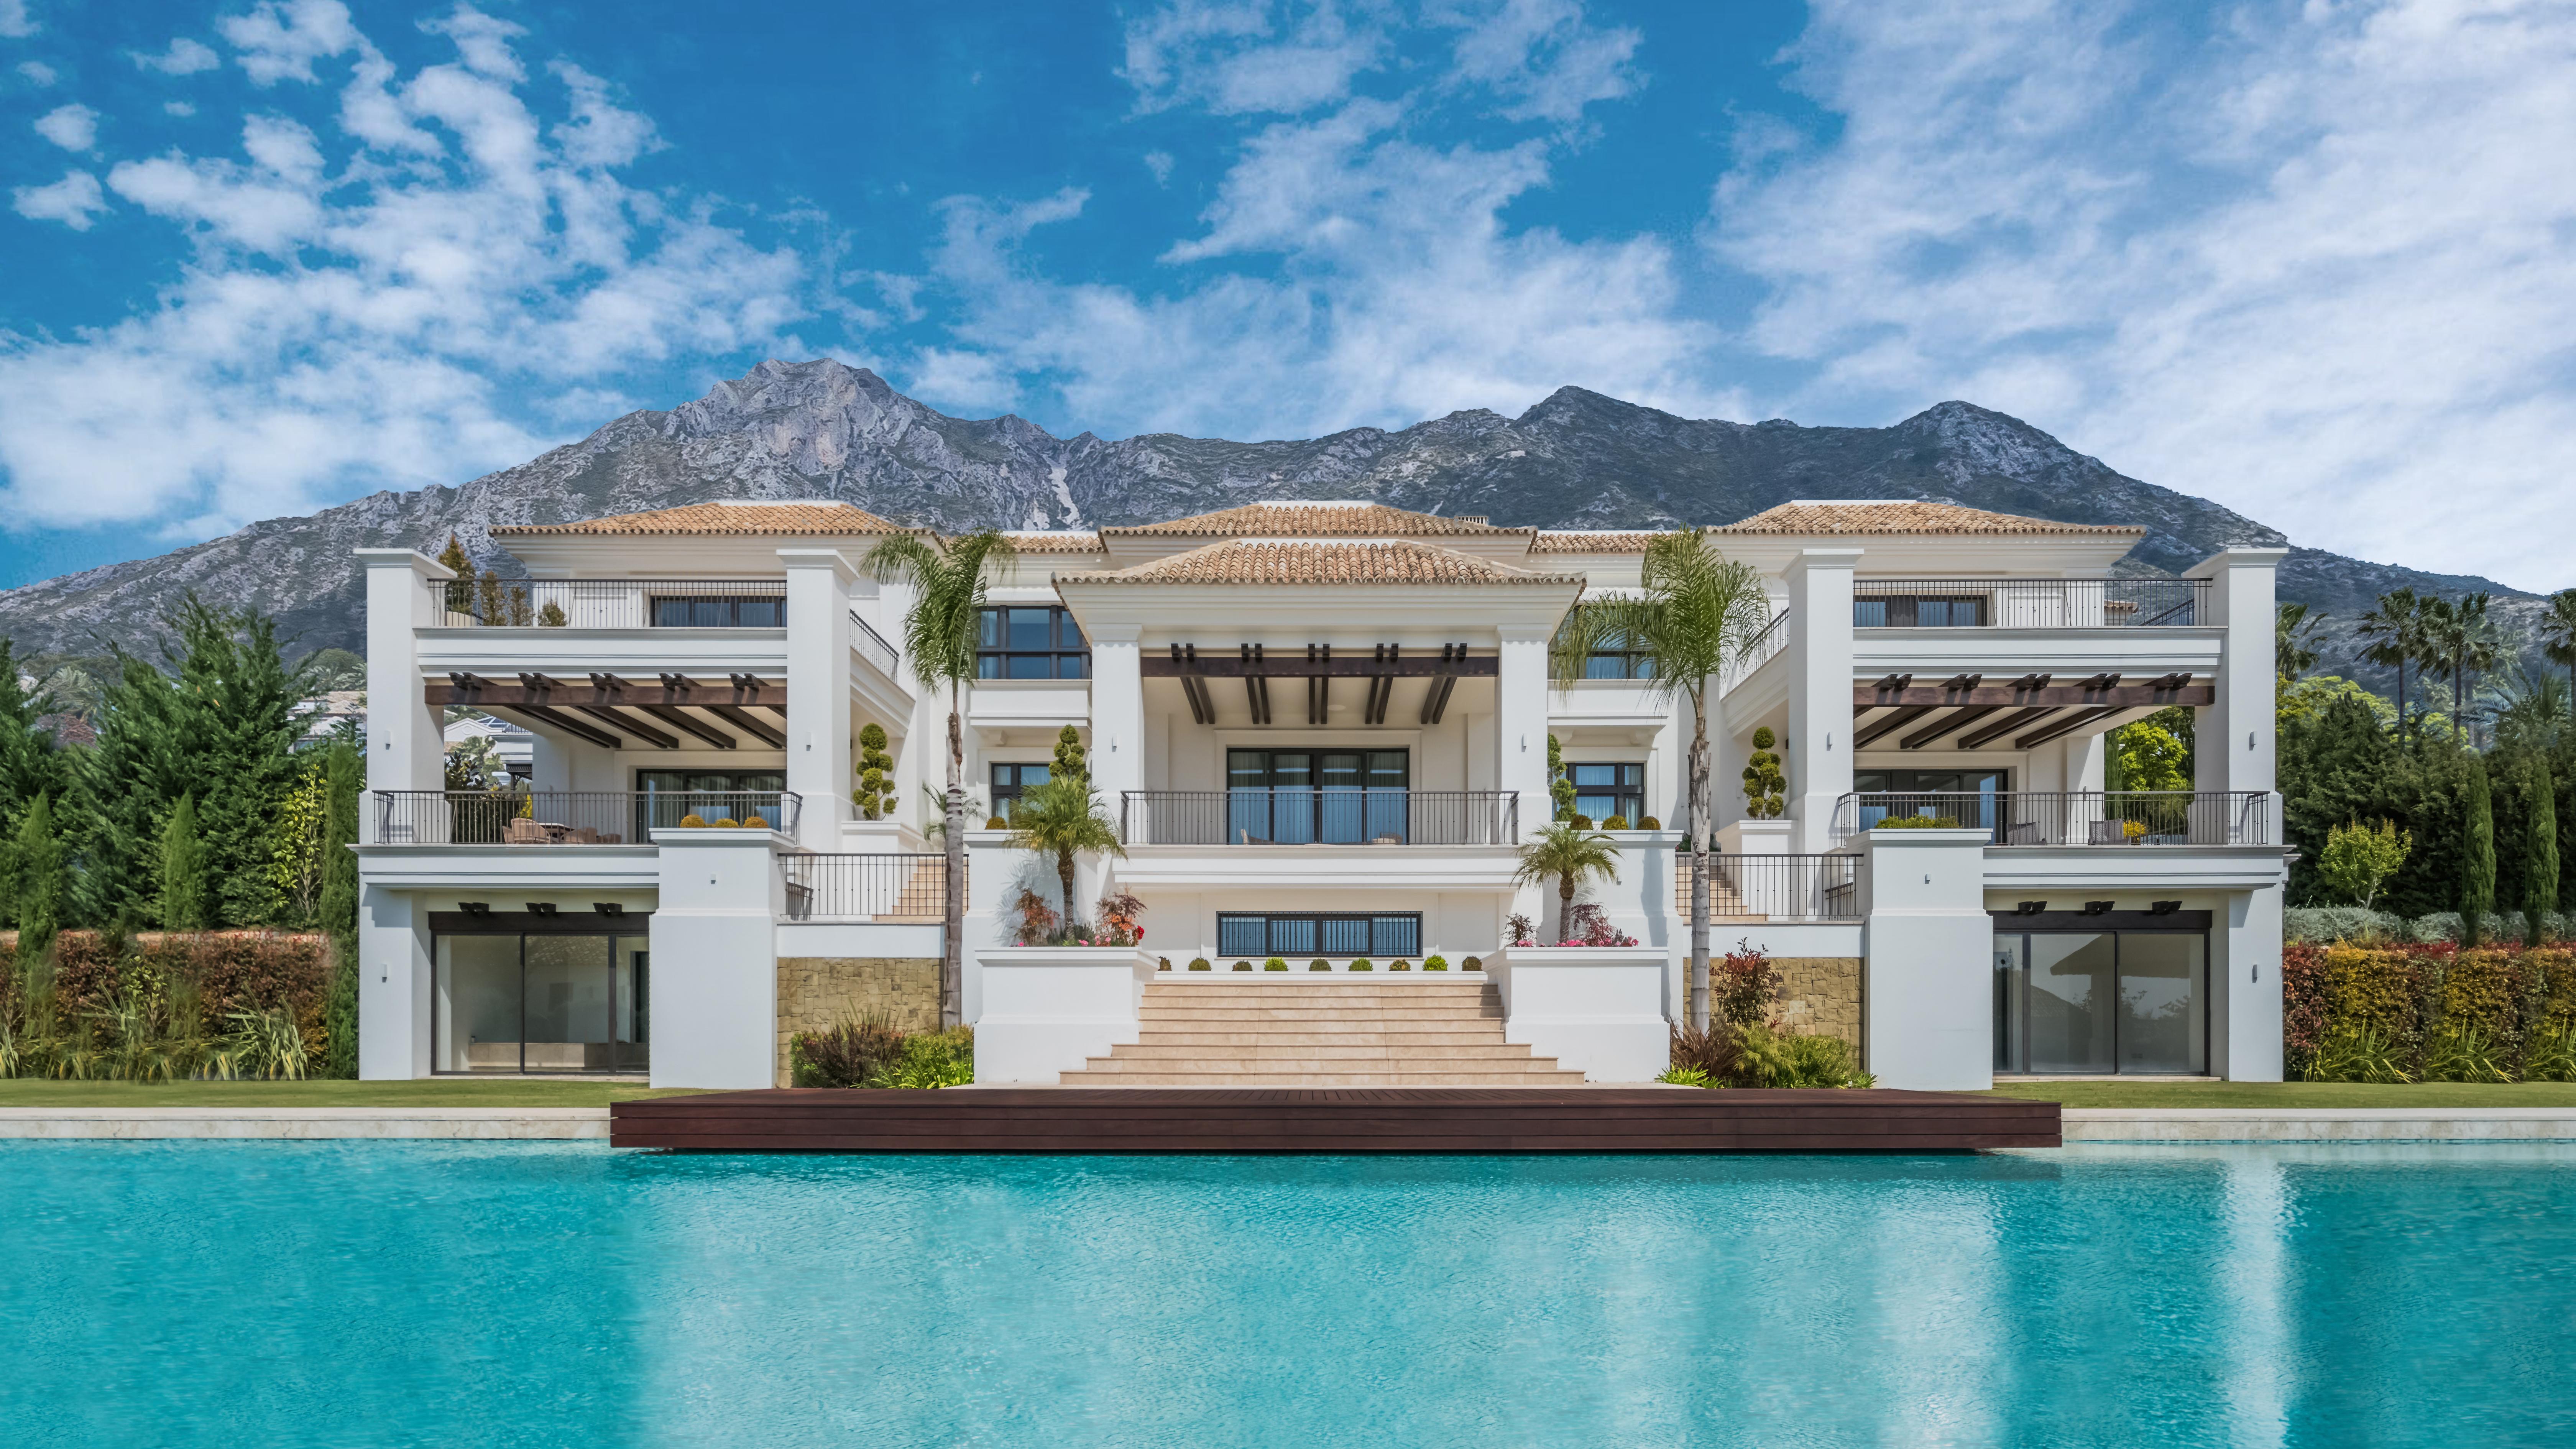 LUX0359: Villa in Marbella